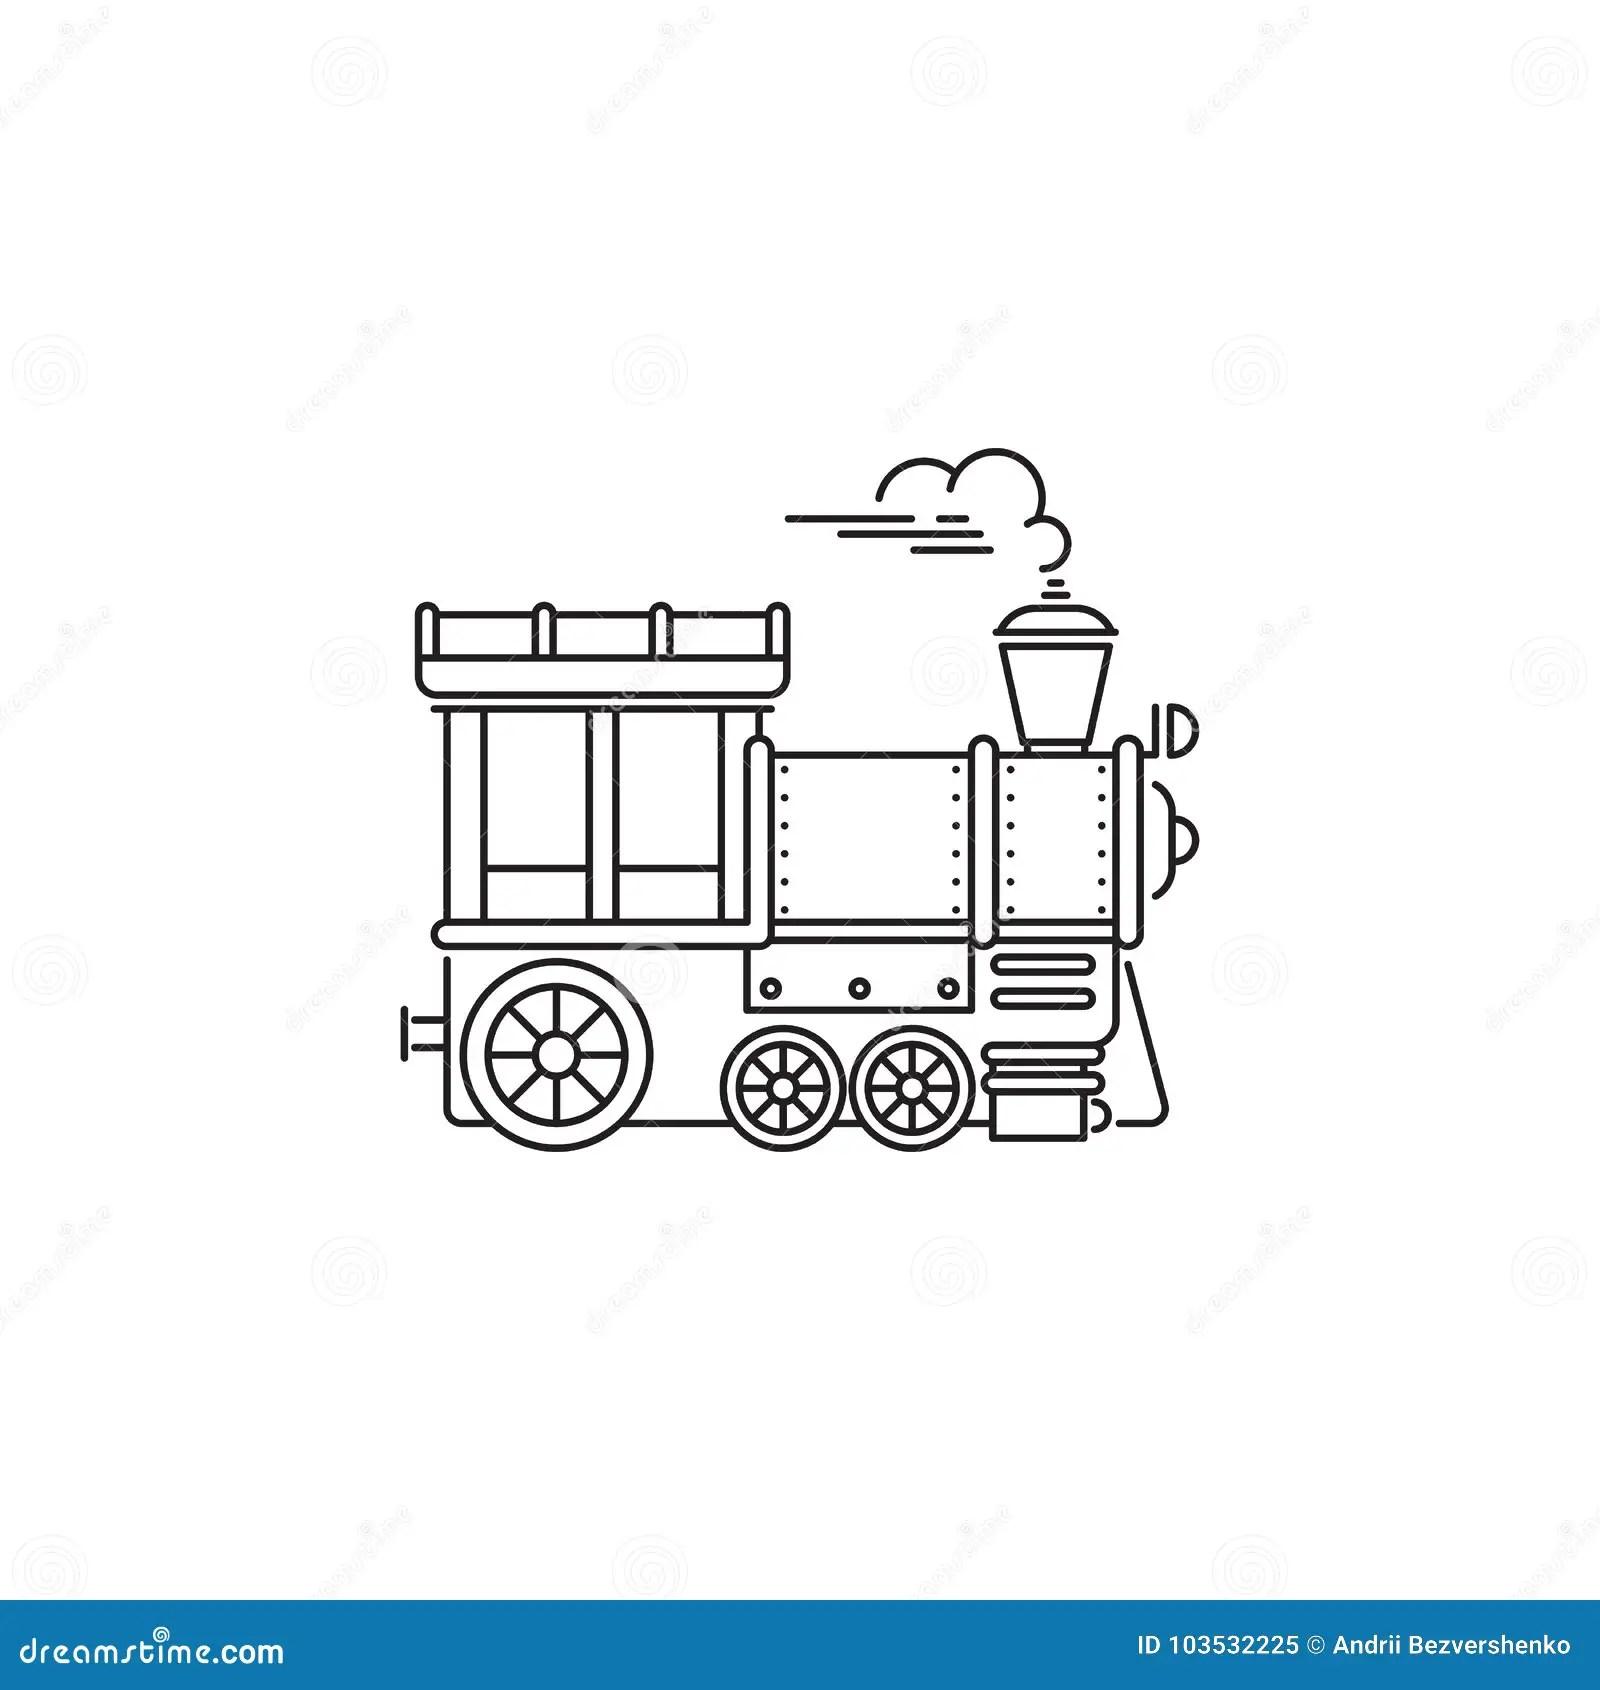 Park Train Locomotive Icon Vector Linear Design Isolated